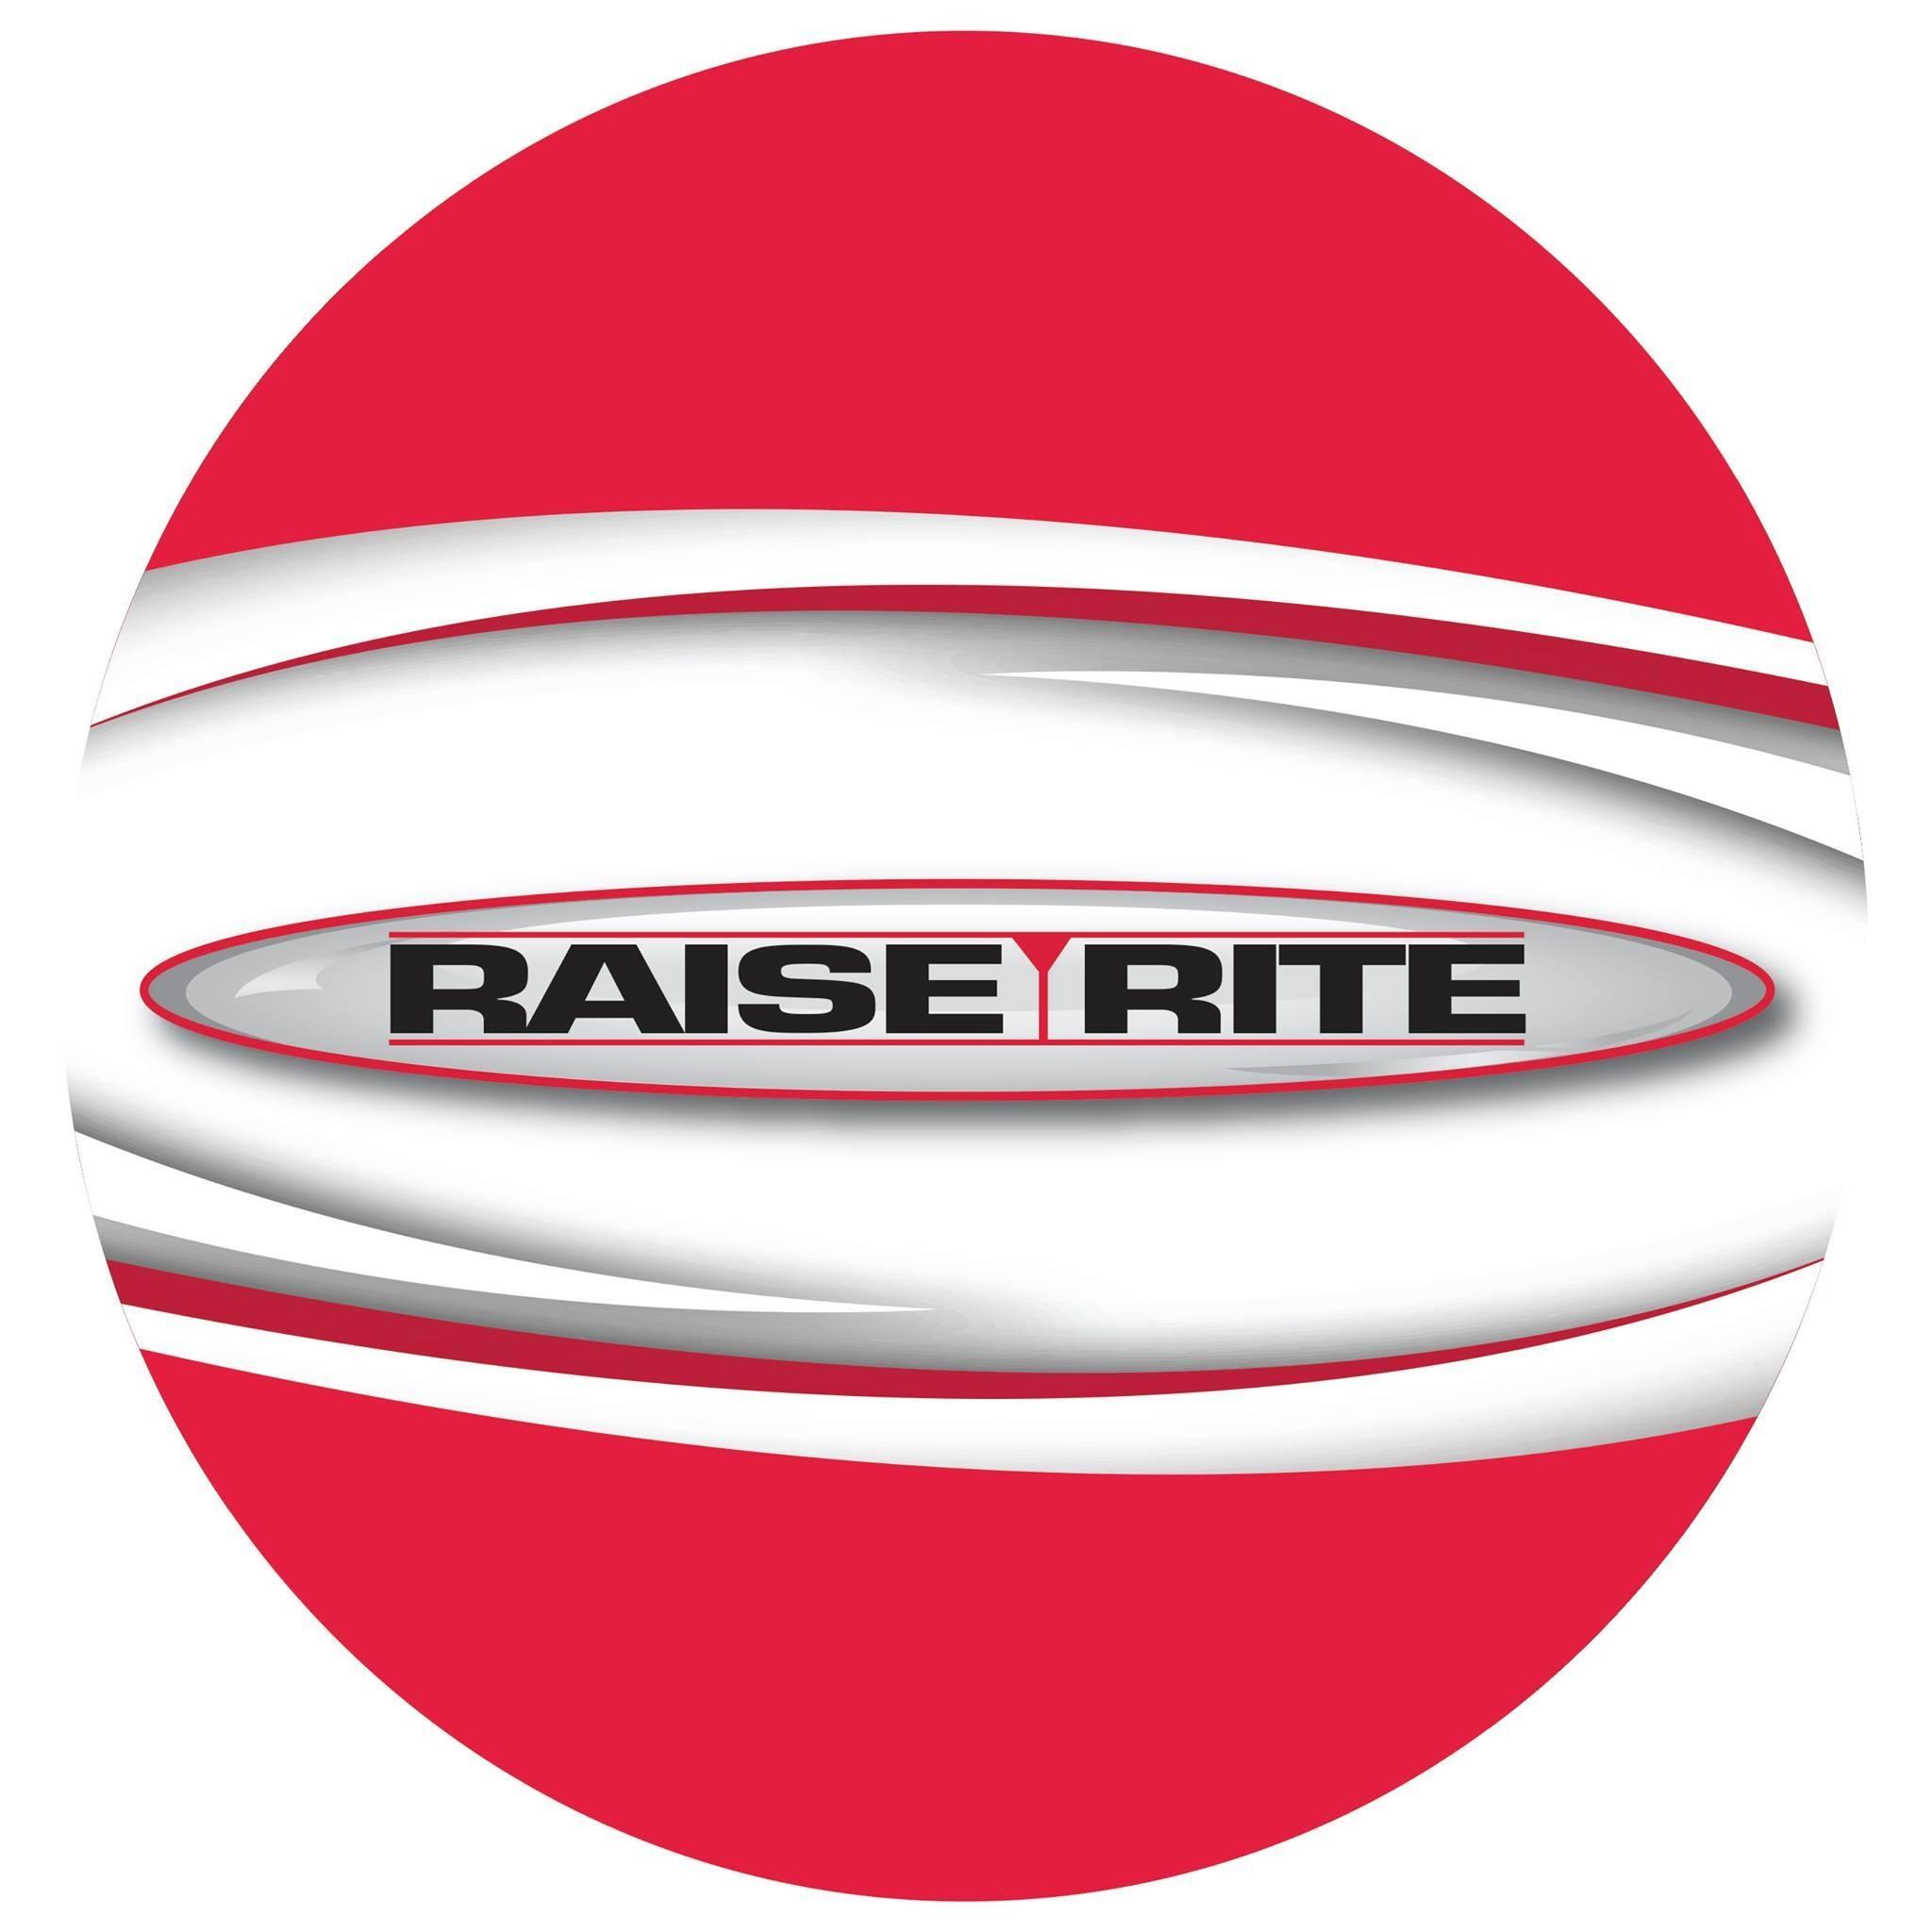 RaiseRite Concrete Lifting, Inc.